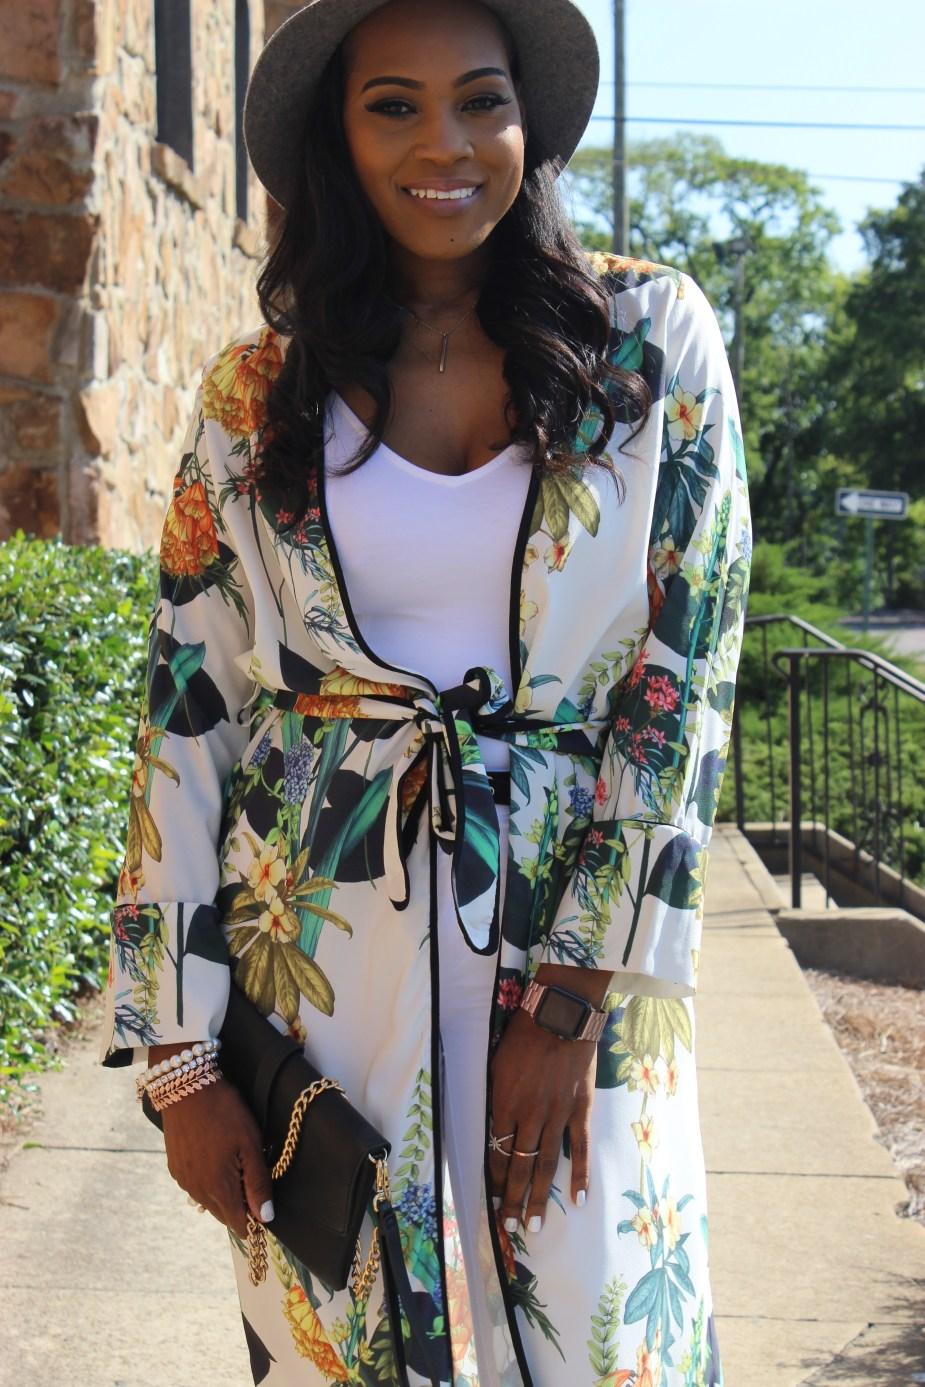 Style-files-White-Civil-Skinny-Jeans-forever-21-white-bodysuit-shein-white-floral-Open Front Longline Kimono -Cape-Ribbon-black-Meg Ankle Strap Beaded Heel-Cape-Ribbon-studded-ankle-strap-sandals-oohlalablog-12